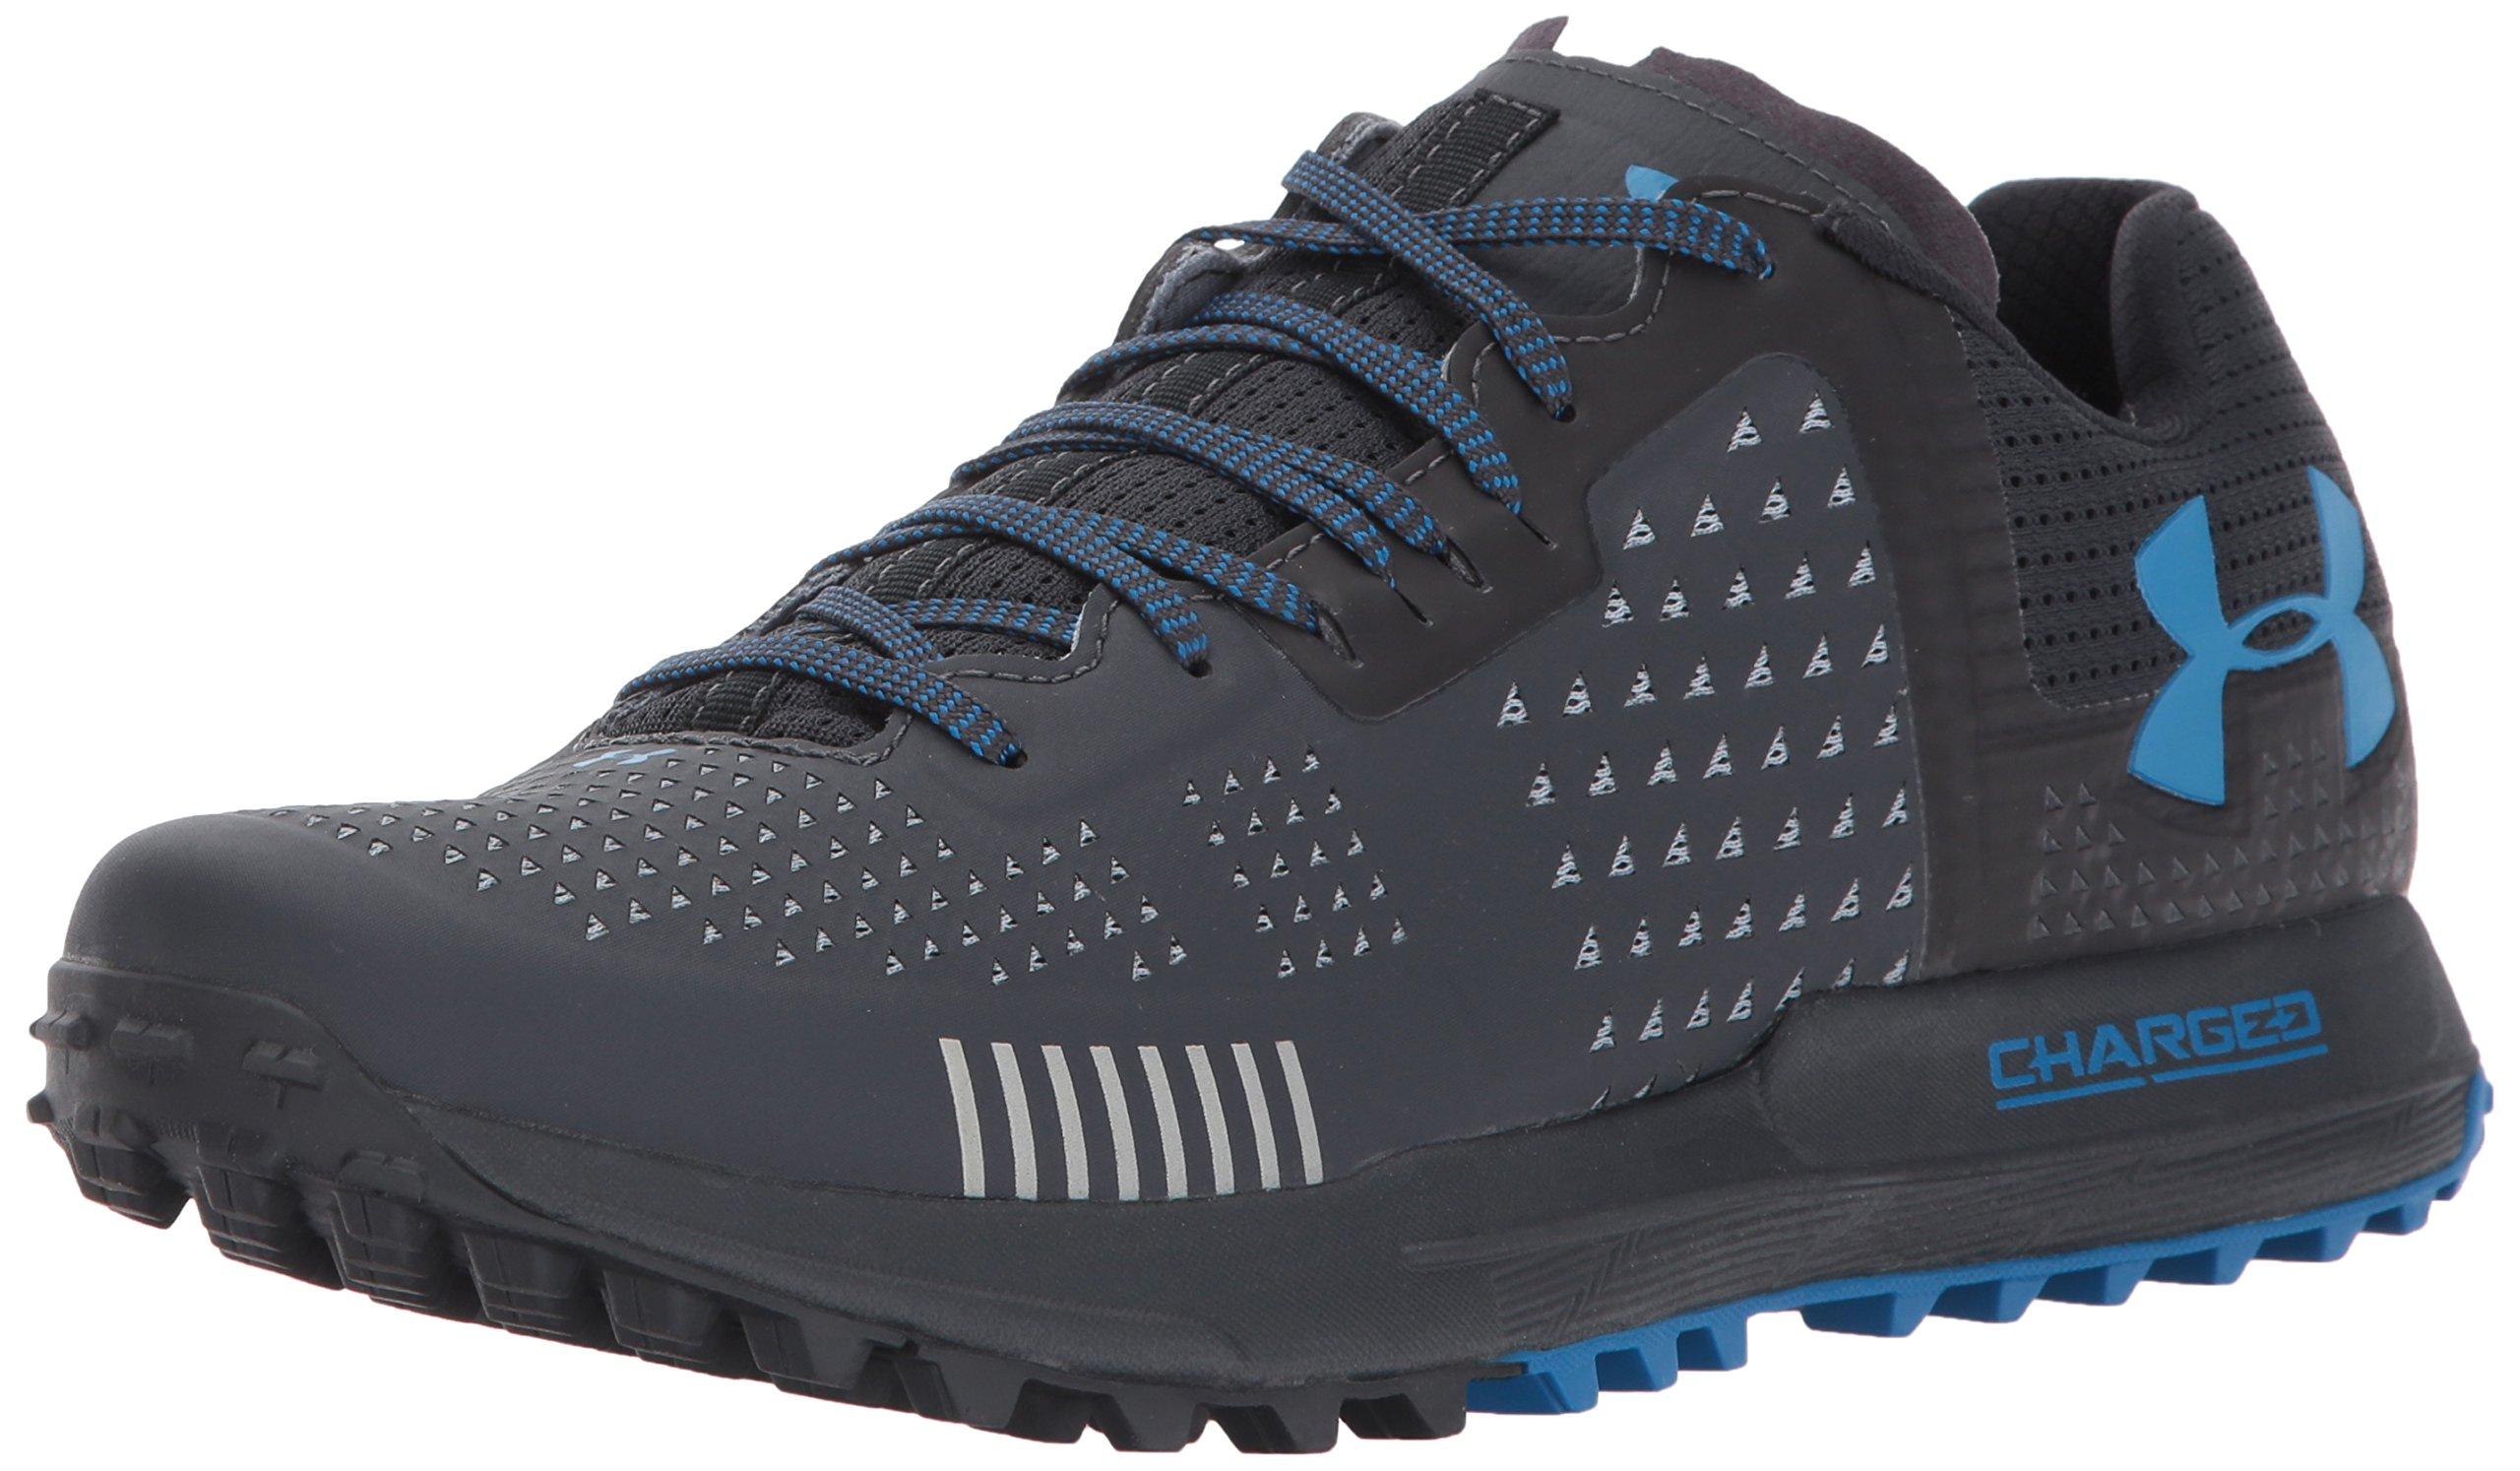 Under Armour Men's Horizon RTT Running Shoe, Anthracite (016)/Anthracite, 8